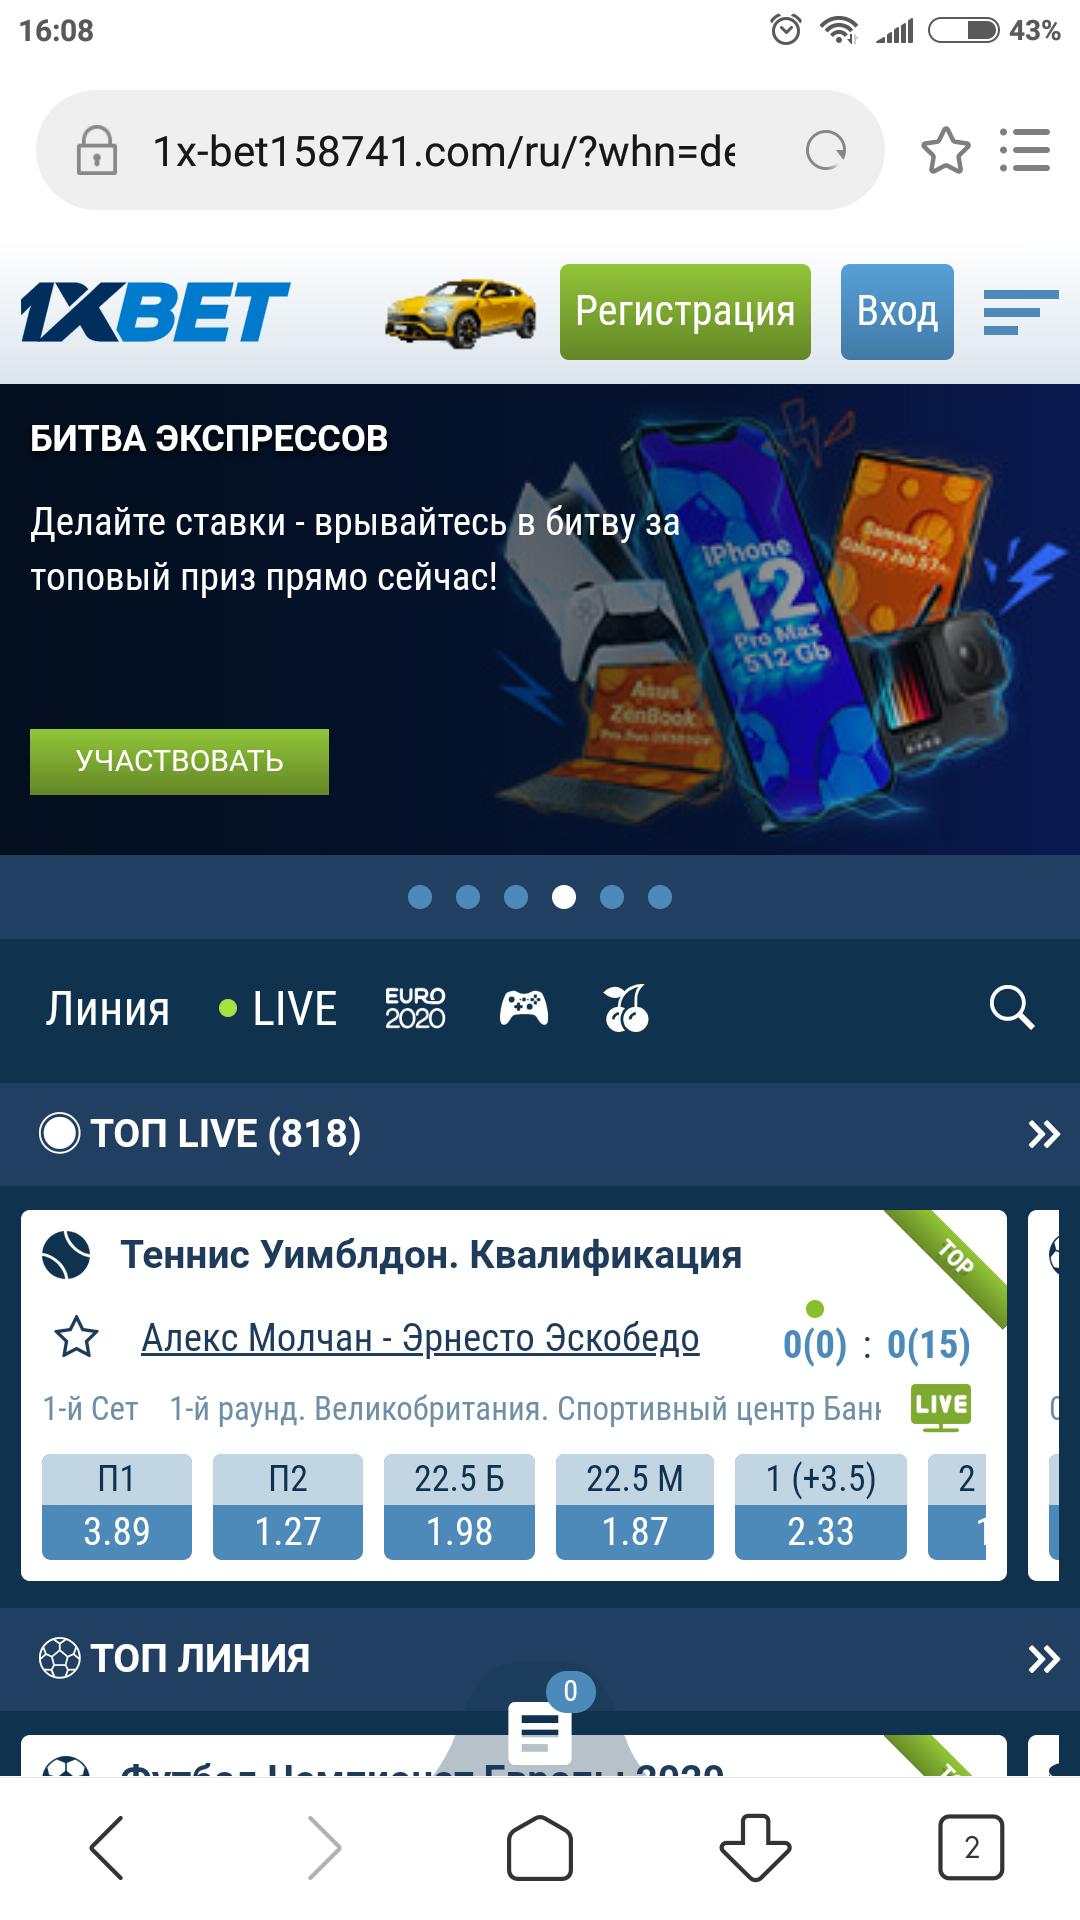 интерфейс бк 1хбет